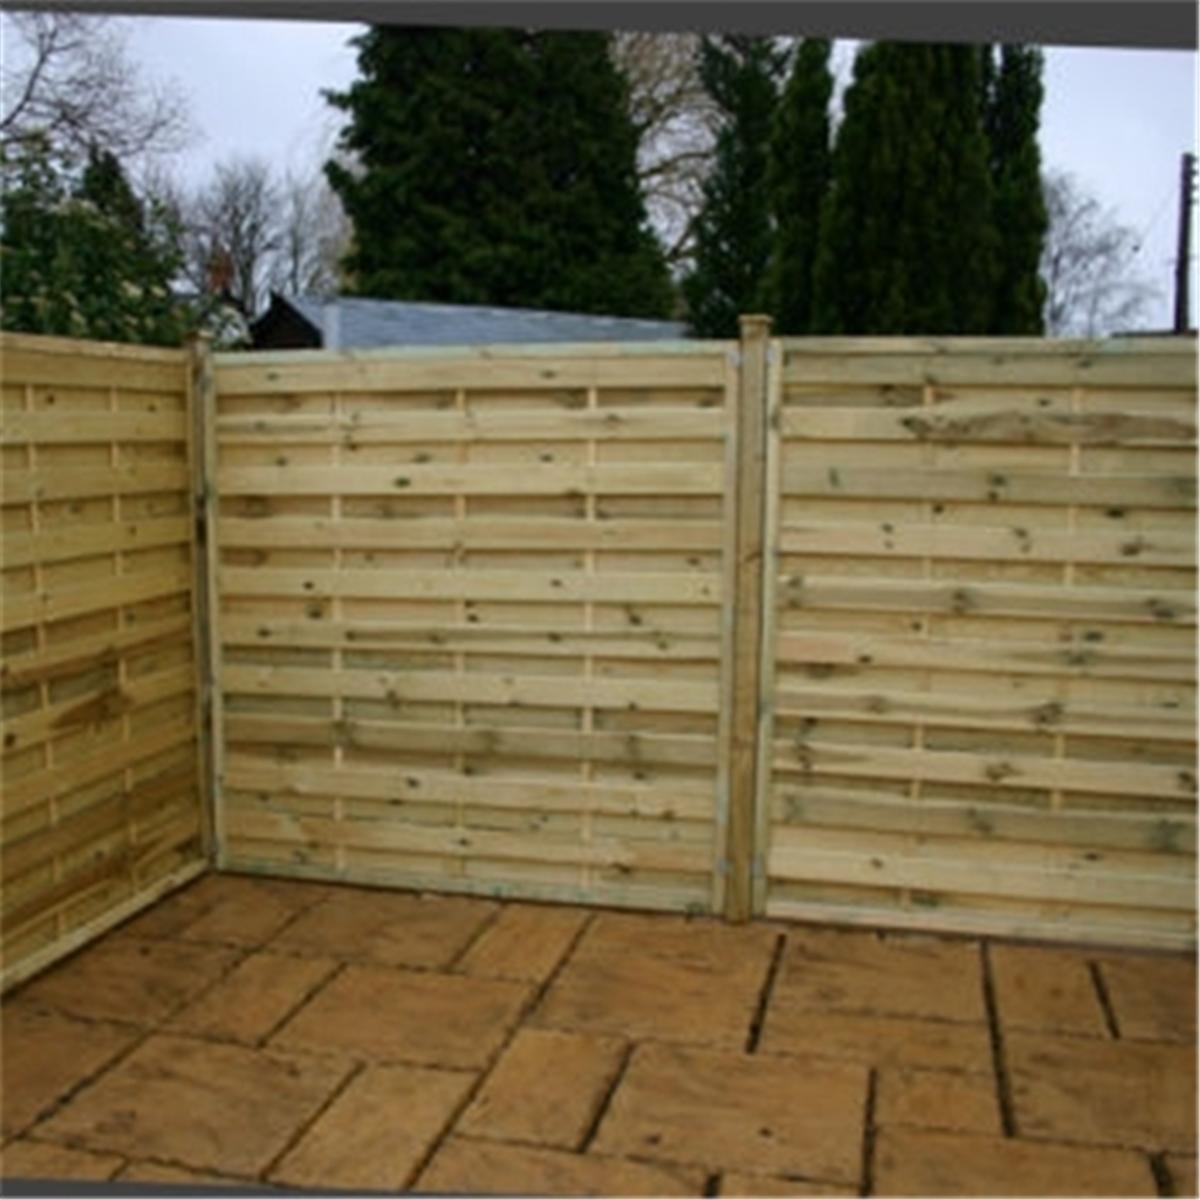 6ft pressure treated horizontal weave fencing panels 1. Black Bedroom Furniture Sets. Home Design Ideas